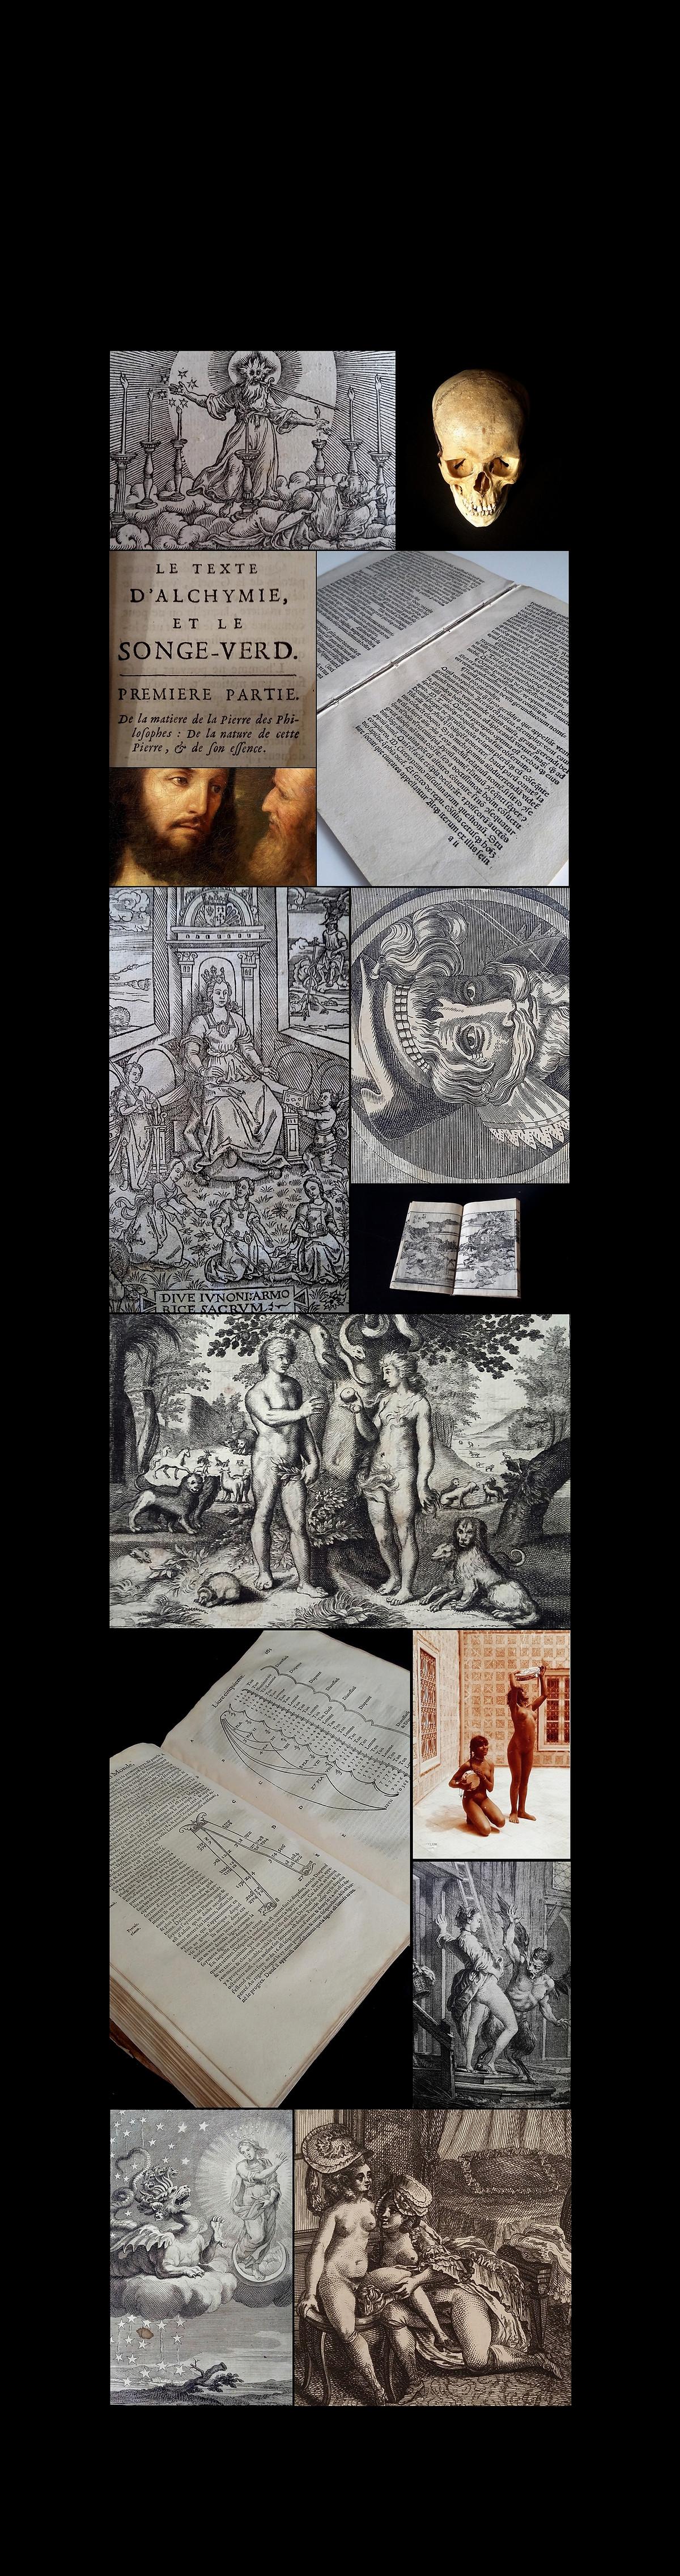 Chevaleyre Livres anciens